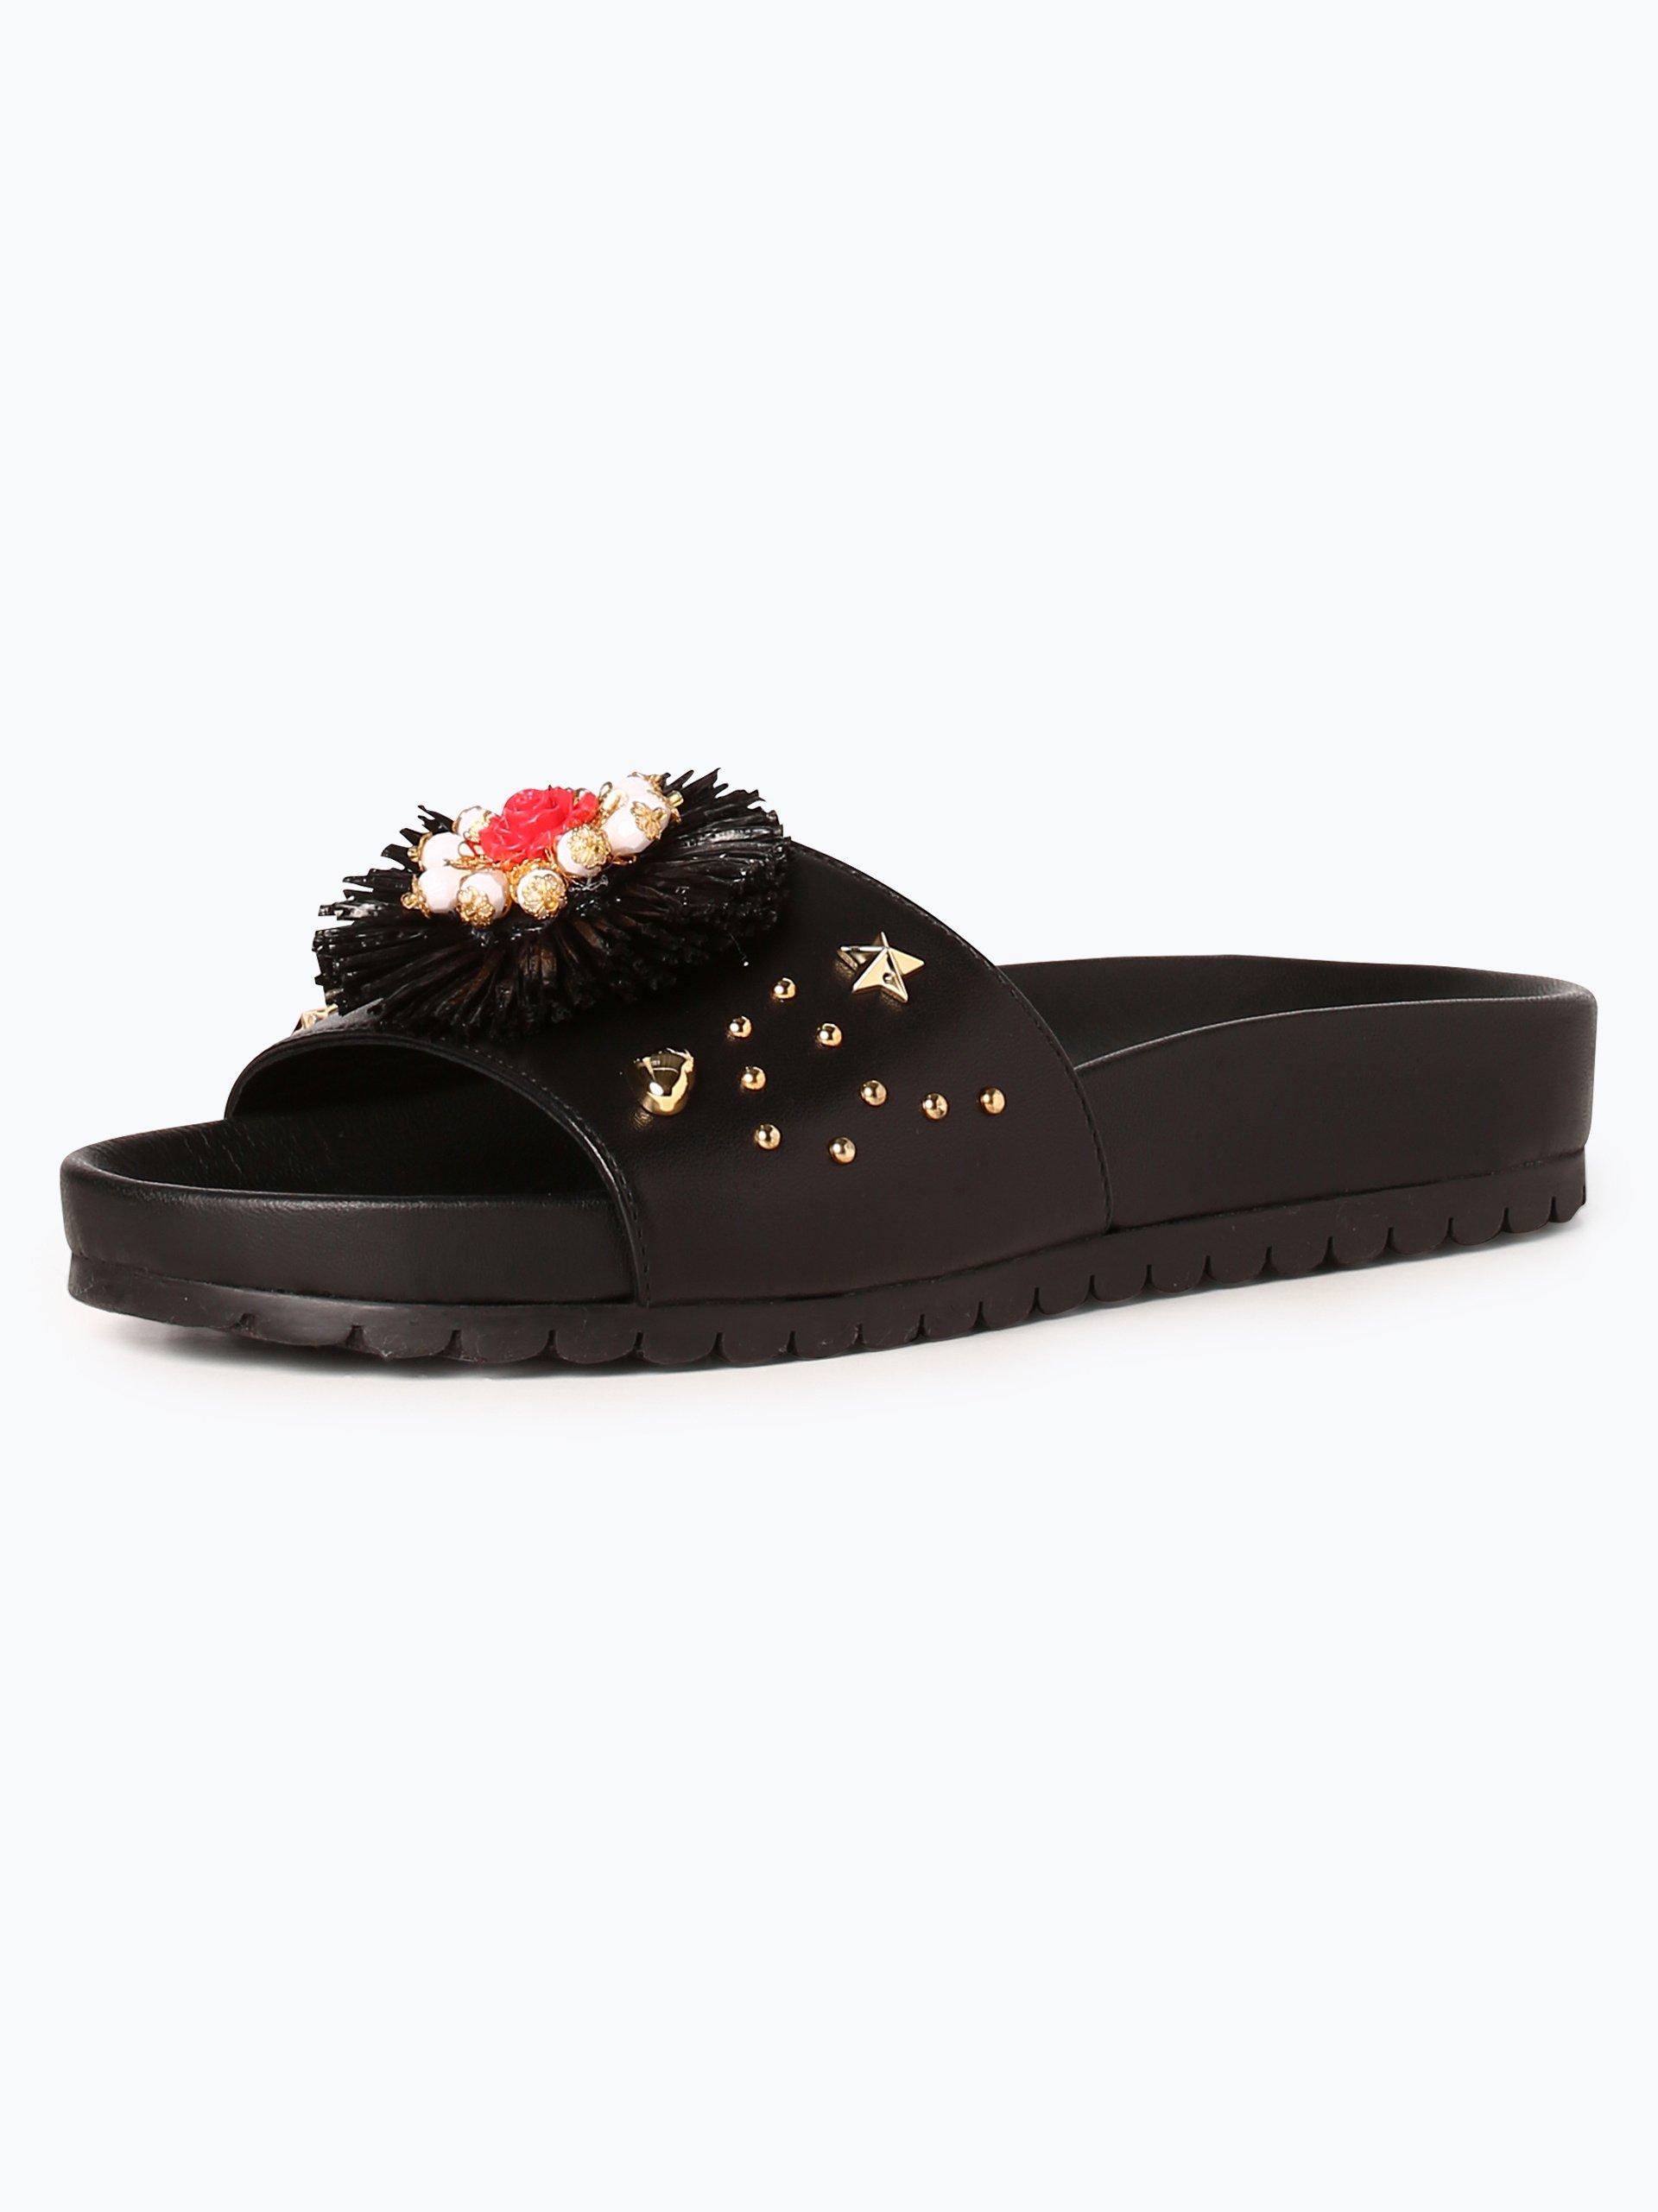 marc sneaker 28 images marc cain bags shoes damen sneaker gr 252 n gemustert marc o. Black Bedroom Furniture Sets. Home Design Ideas